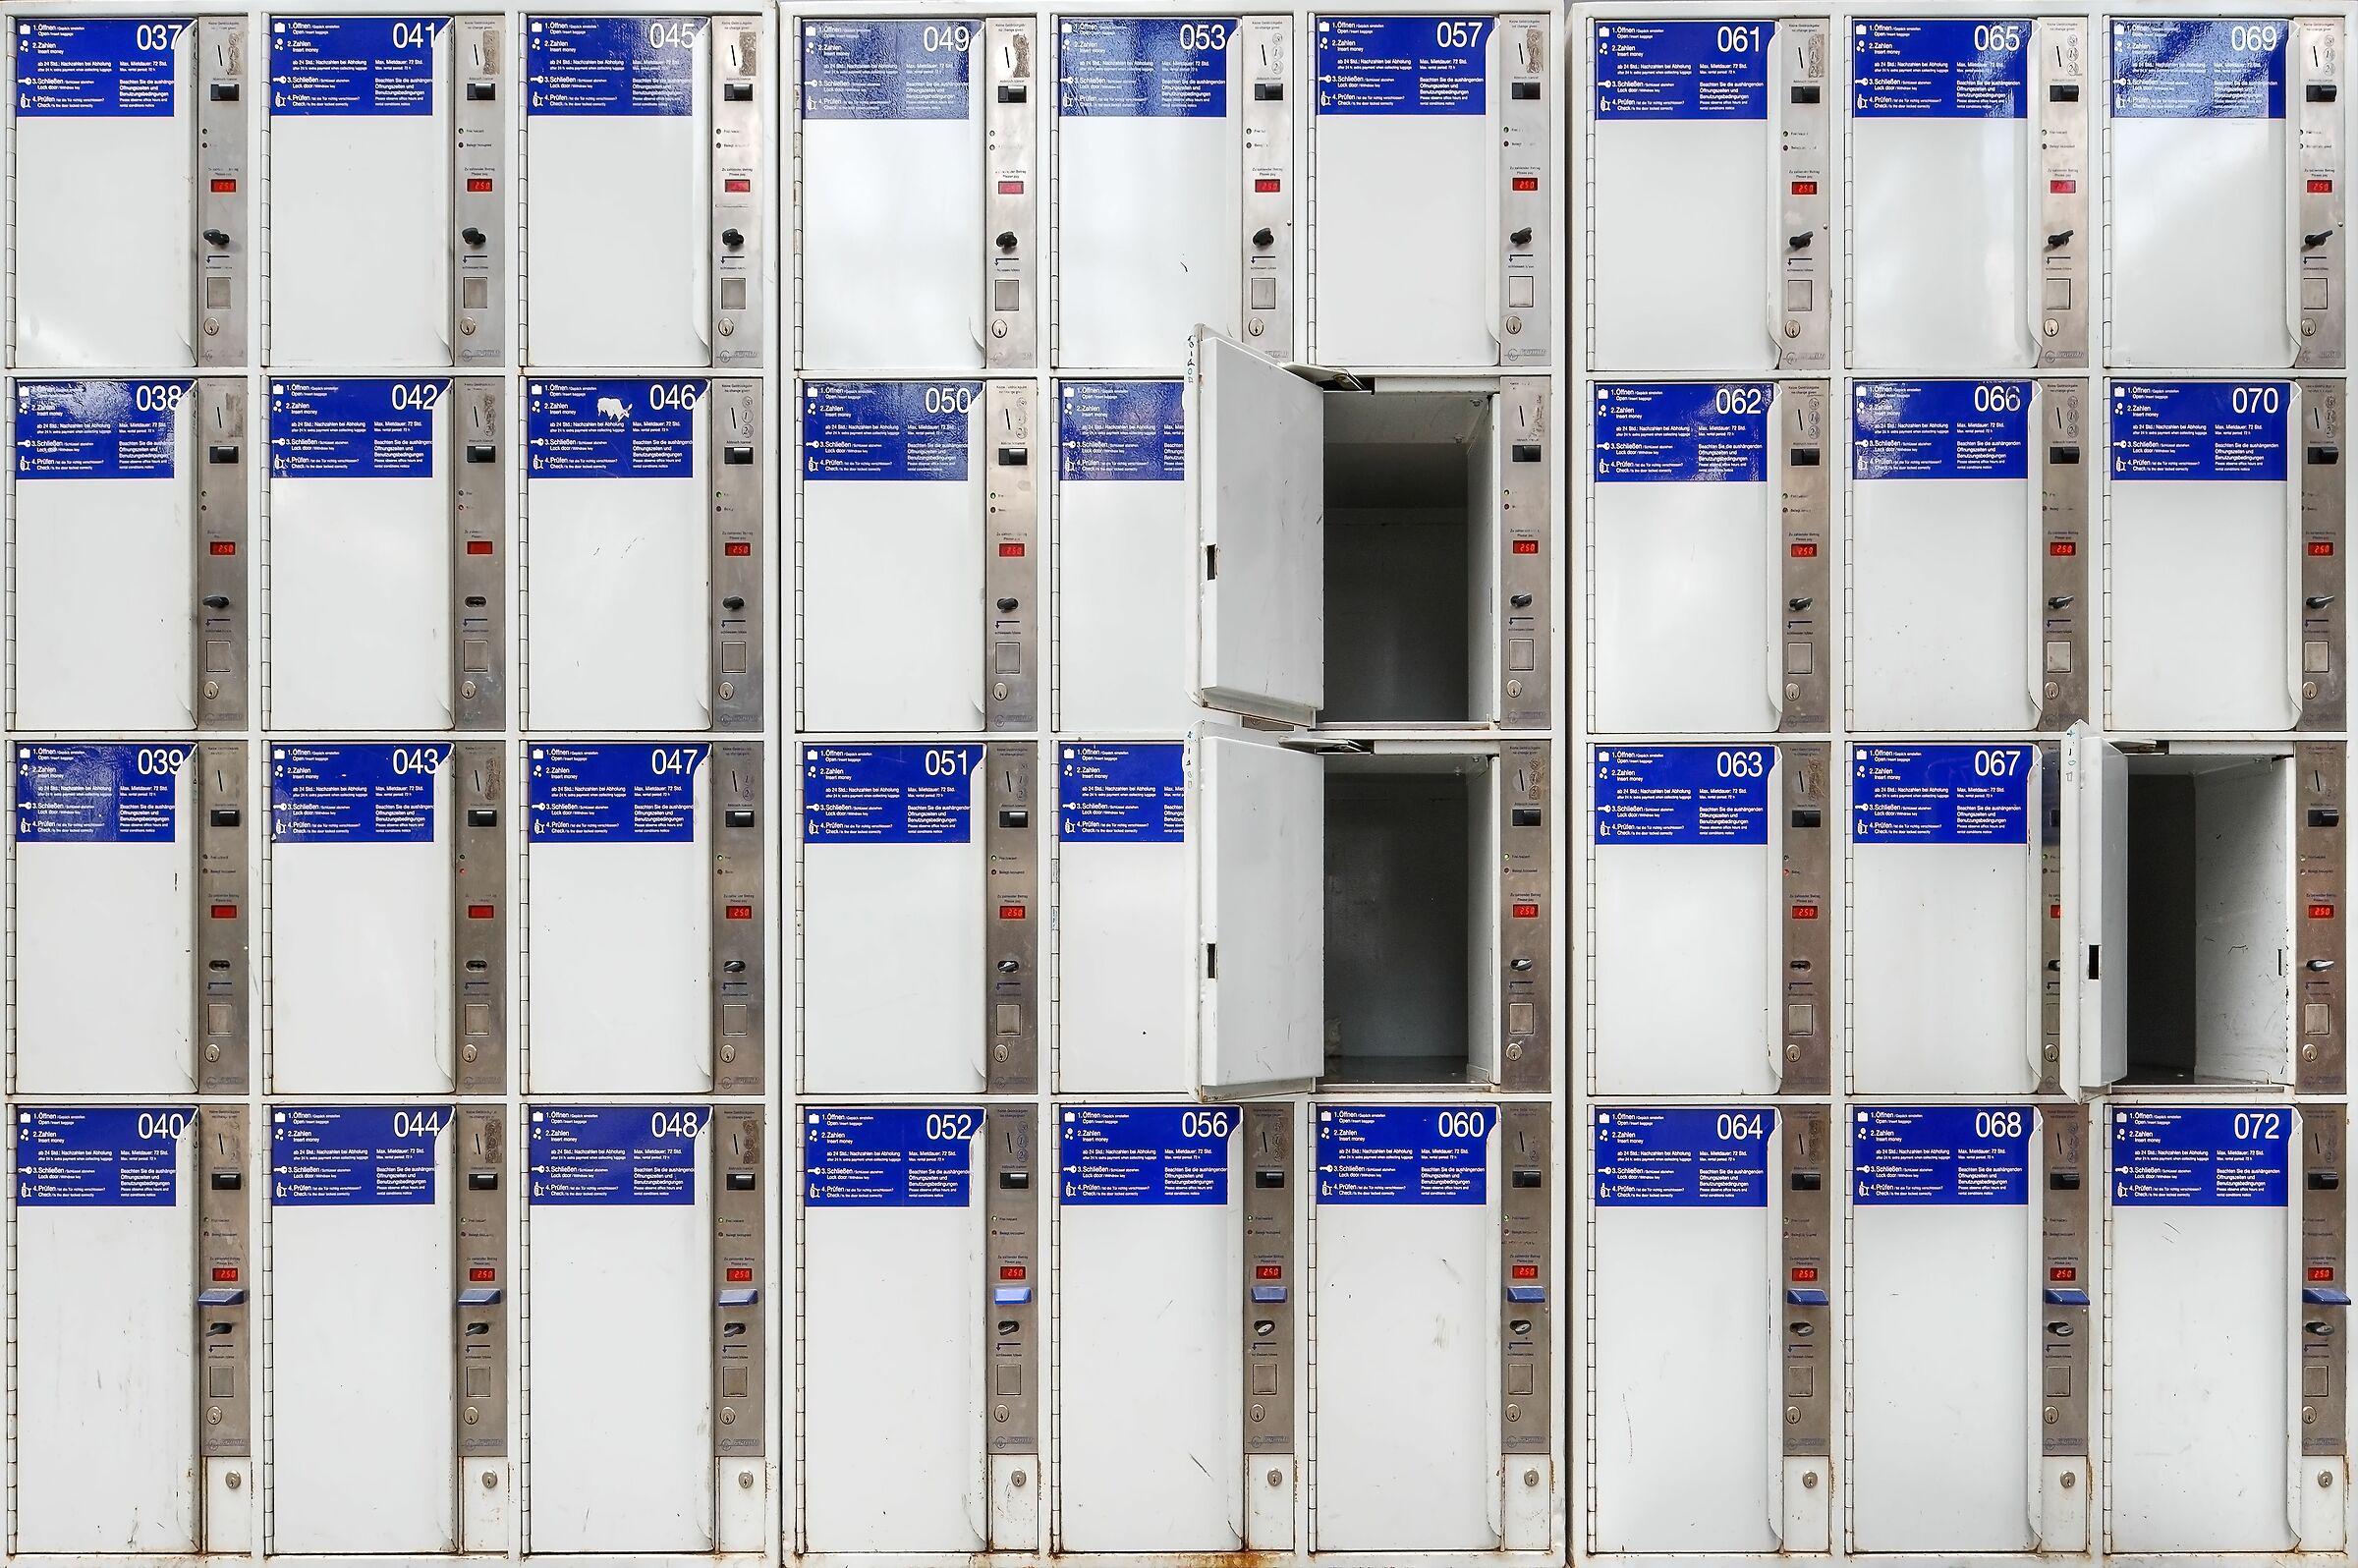 Lockers, Wiesbaden, Germany...